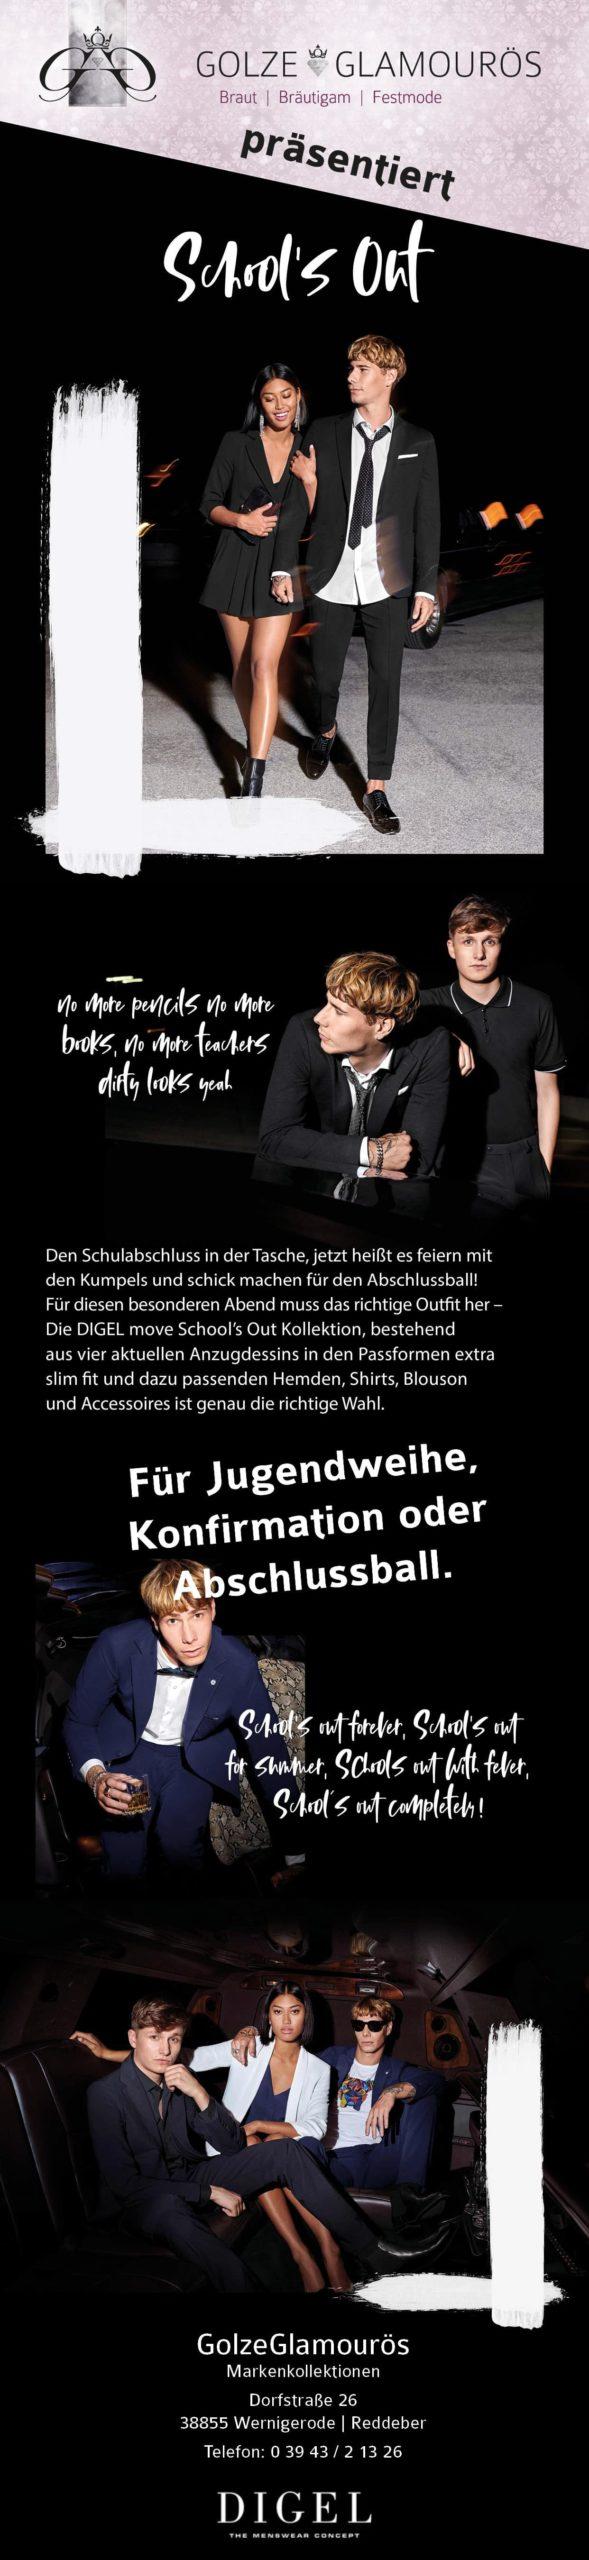 Schools out | Jugendweihe, Konfrimation, Abiball